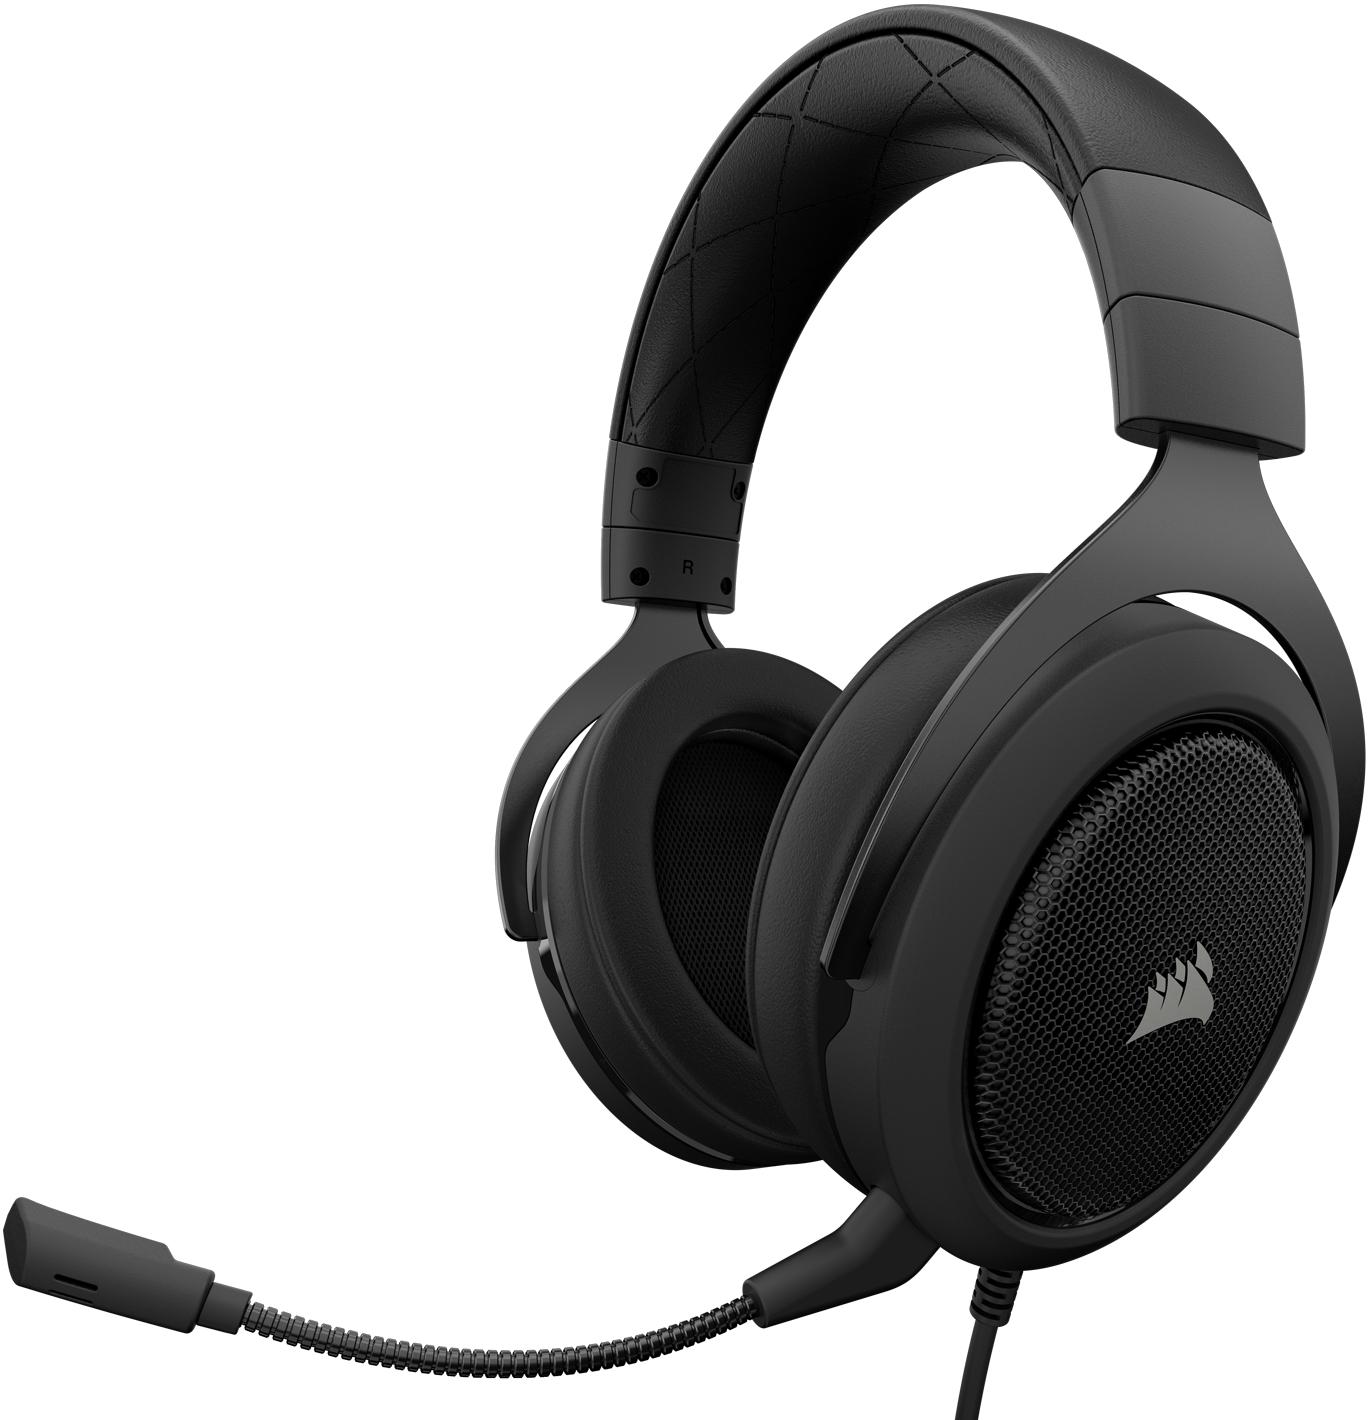 Słuchawki Corsair HS50 Stereo Gaming Headset @ Zadowolenie